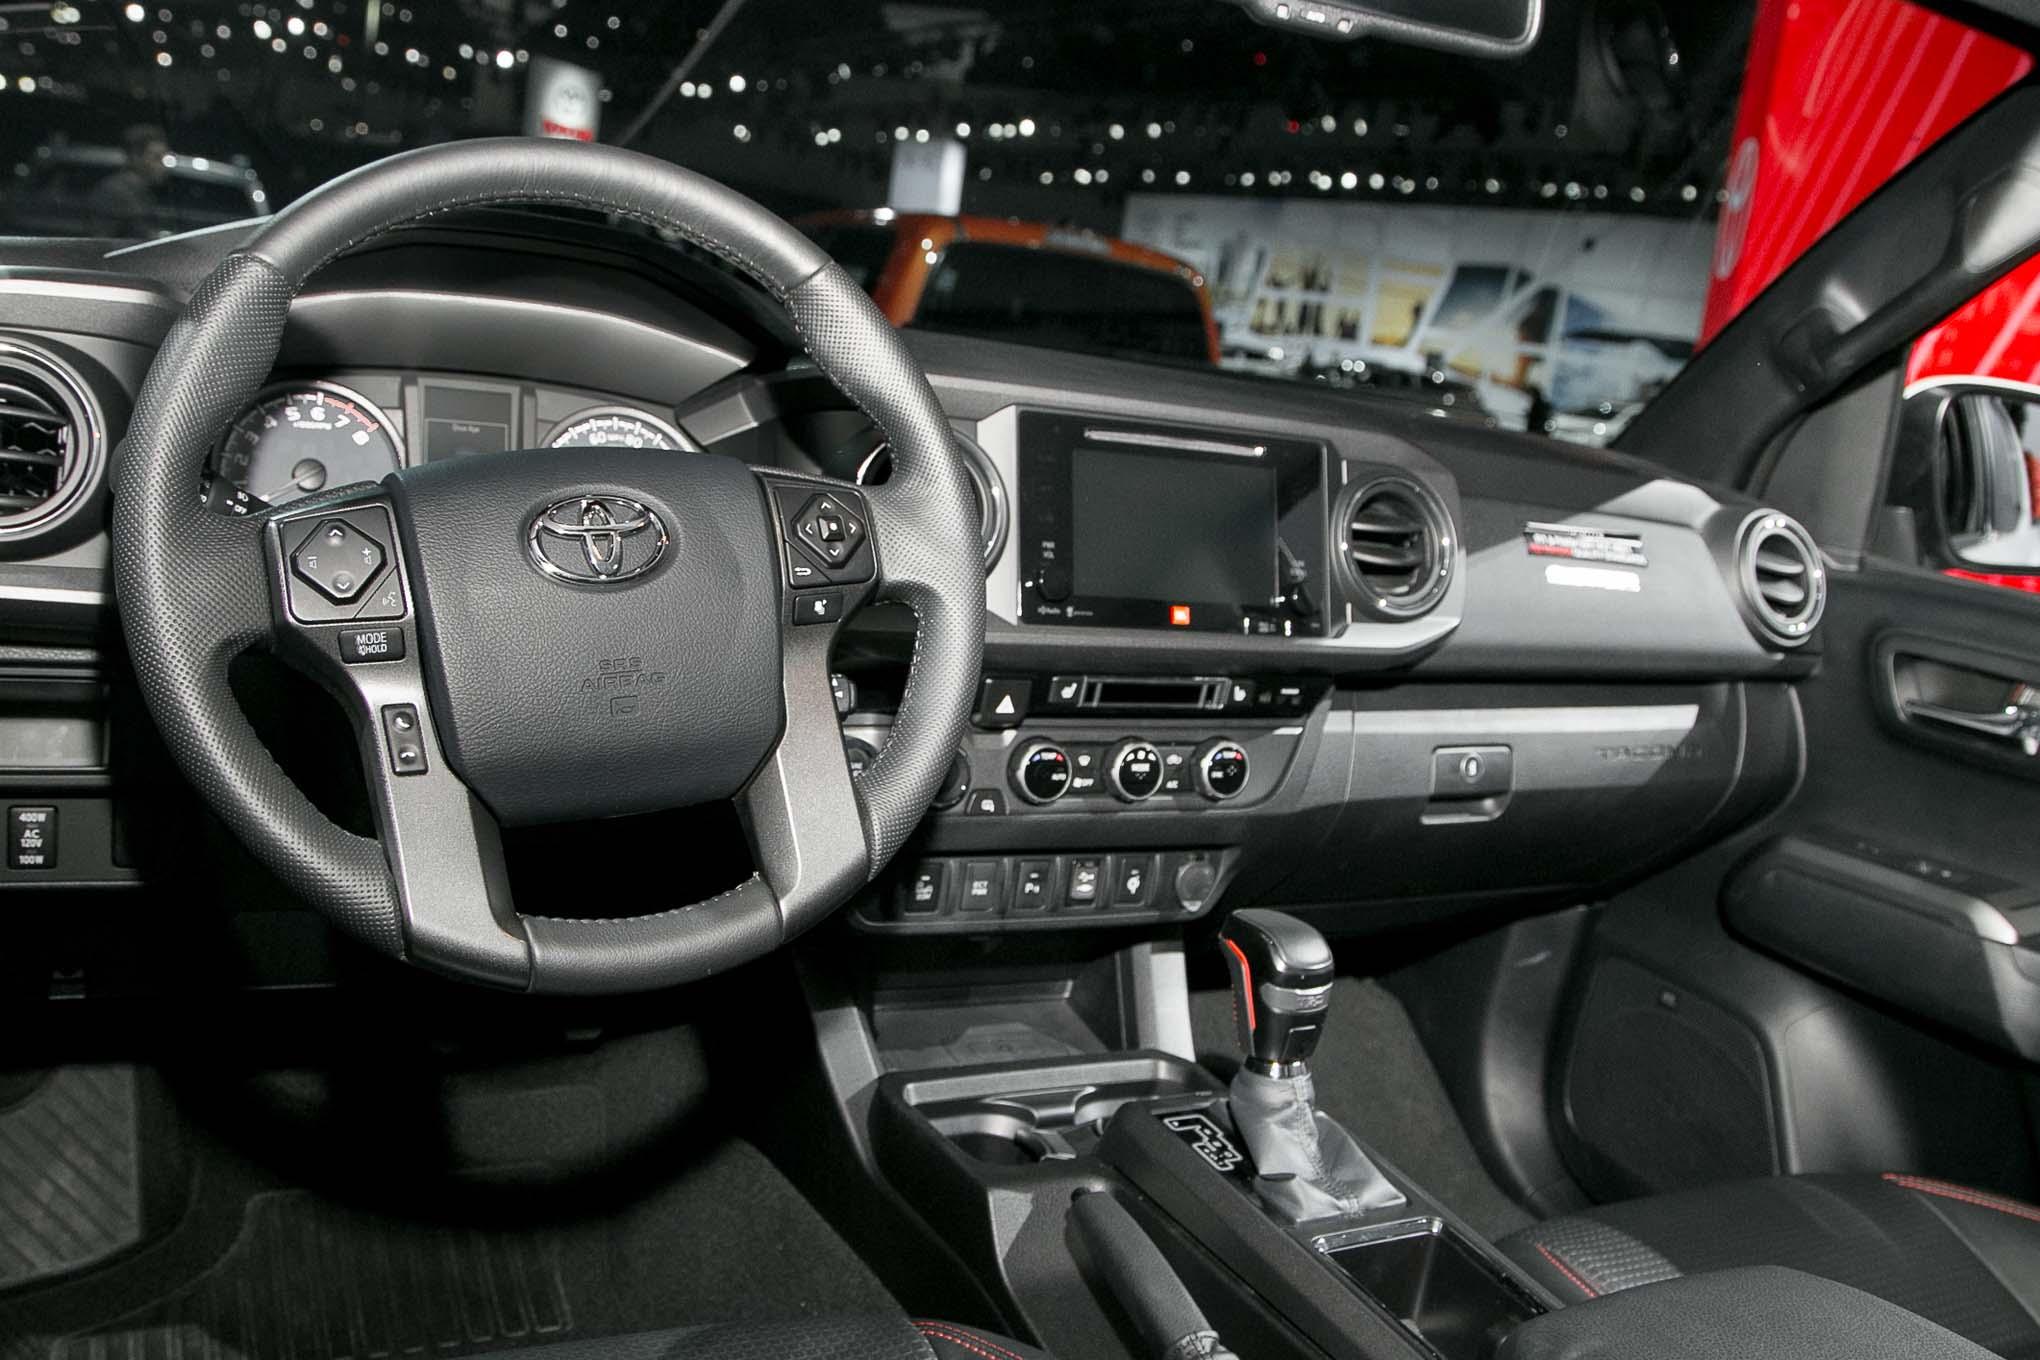 2017 Toyota Tacoma TRD Pro interior